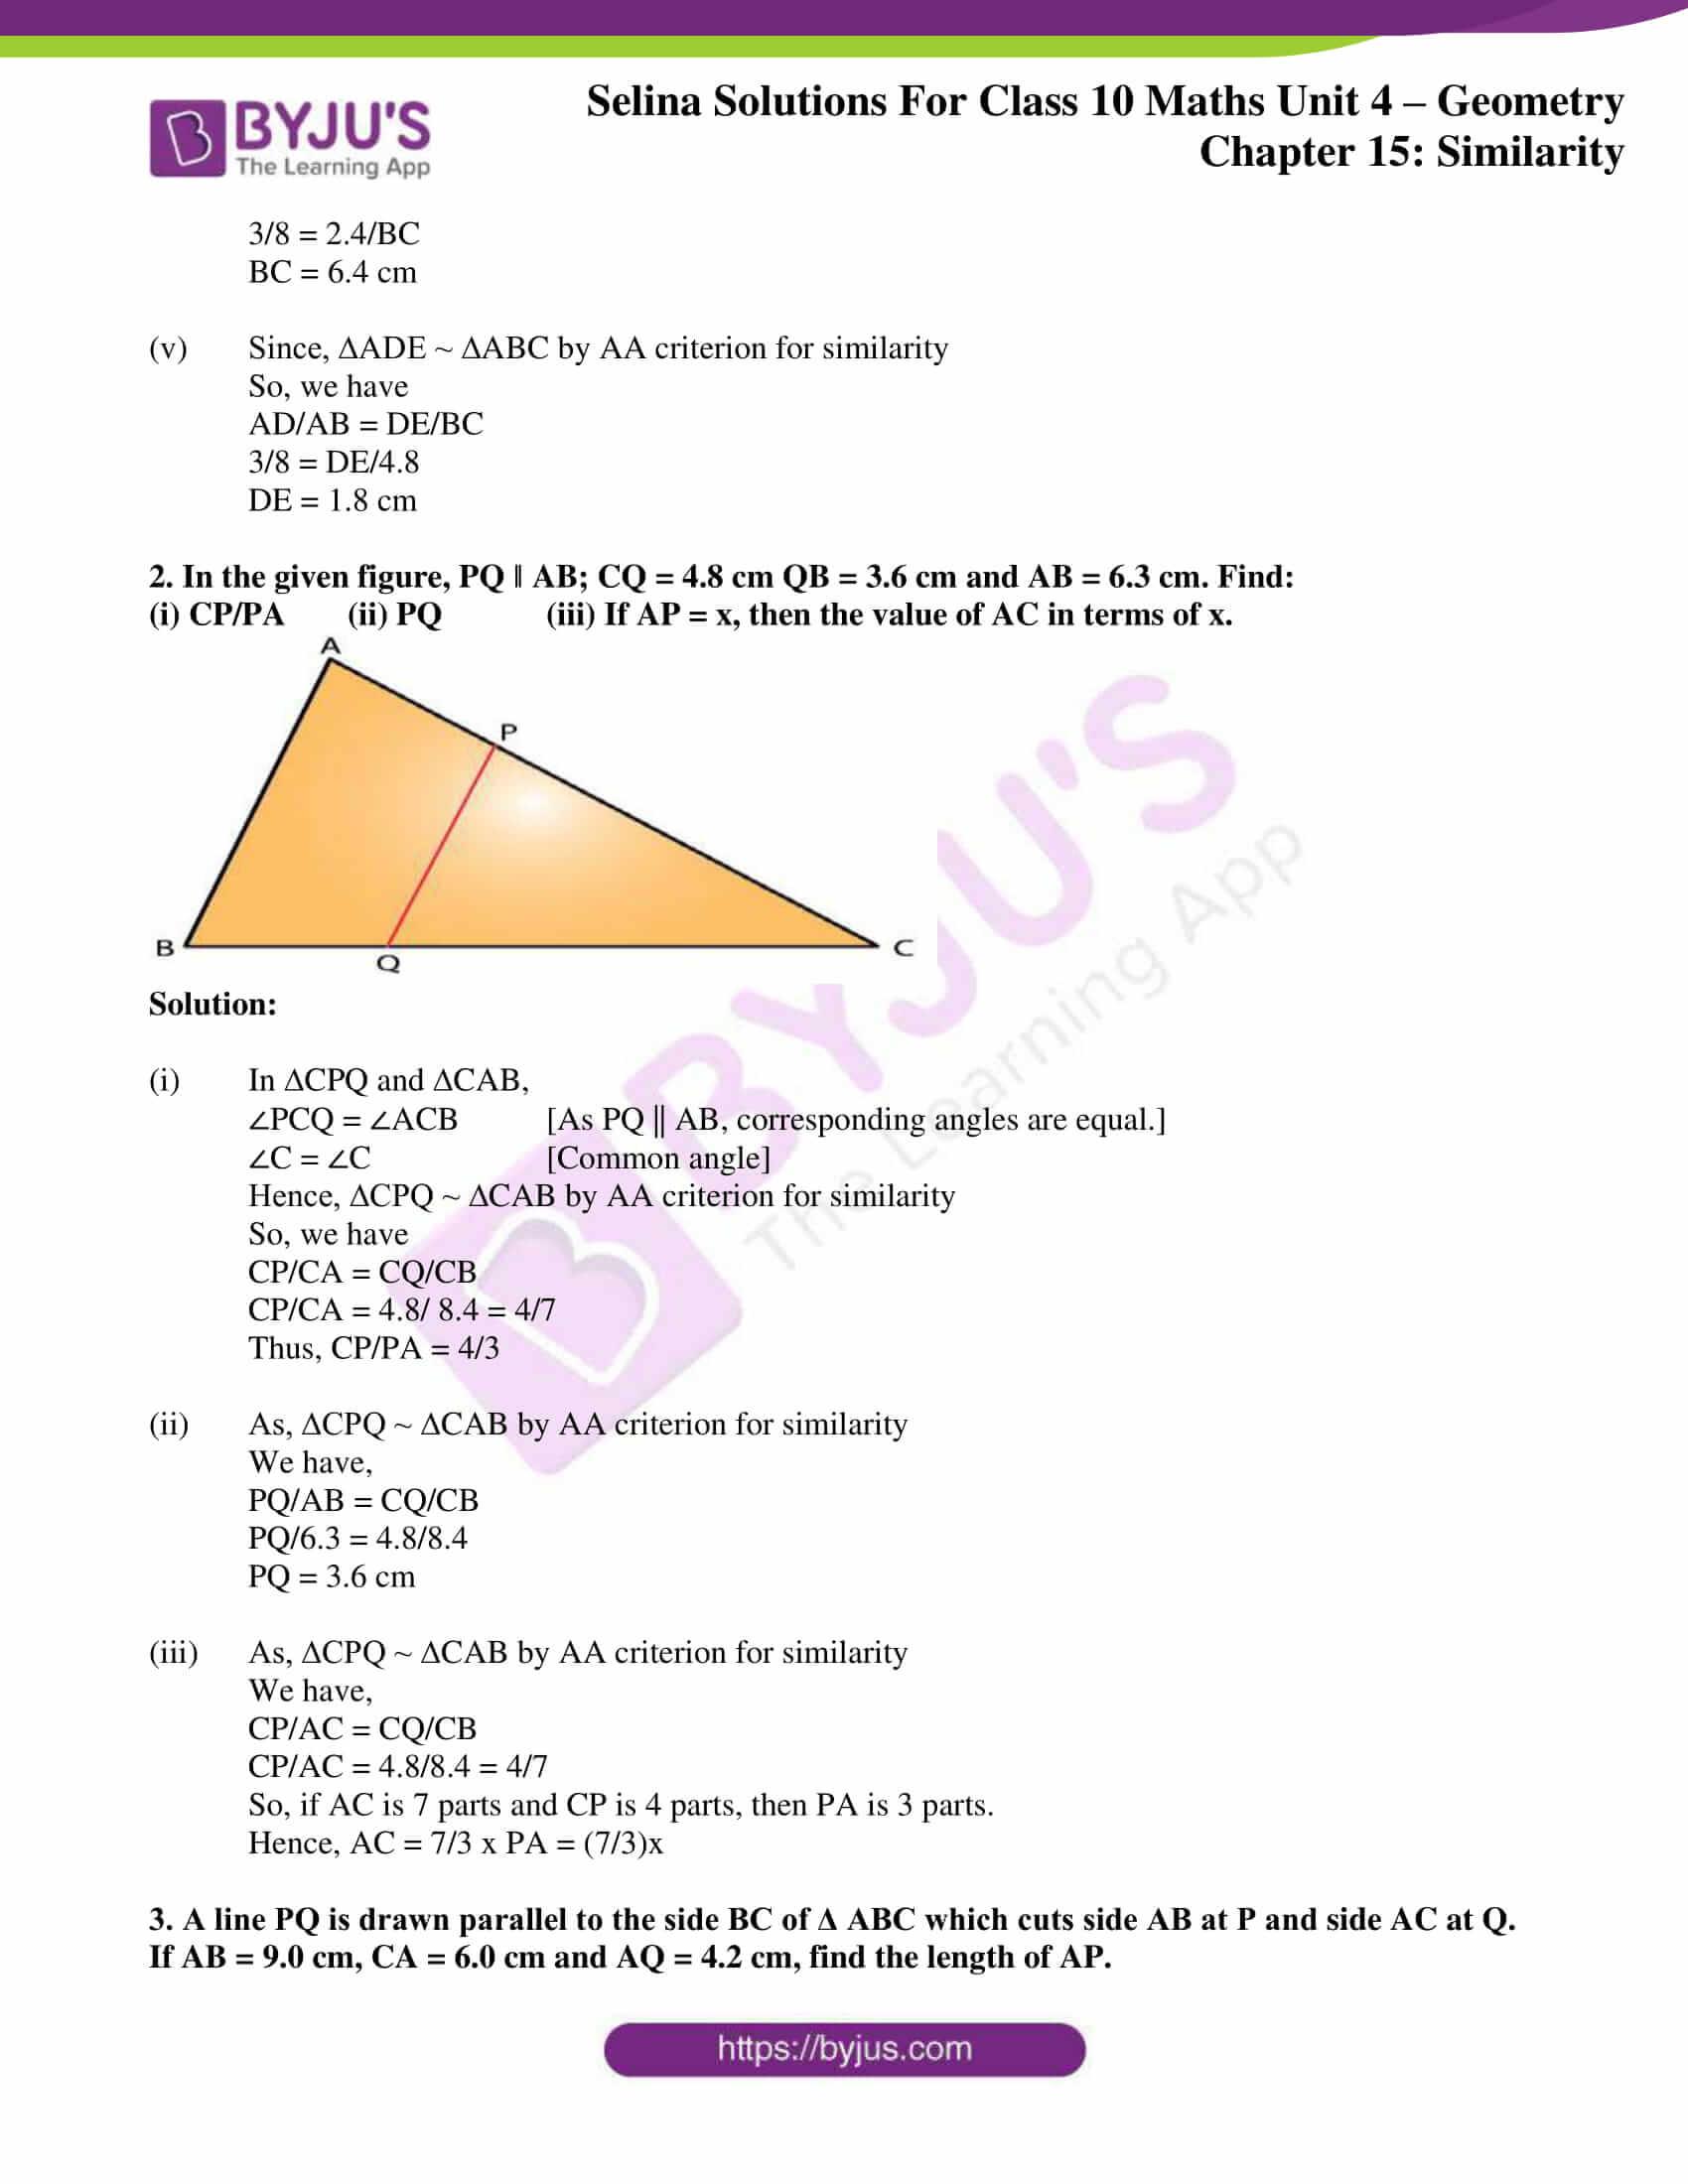 selina-sol-maths-class-10-ch-15-ex-b-2